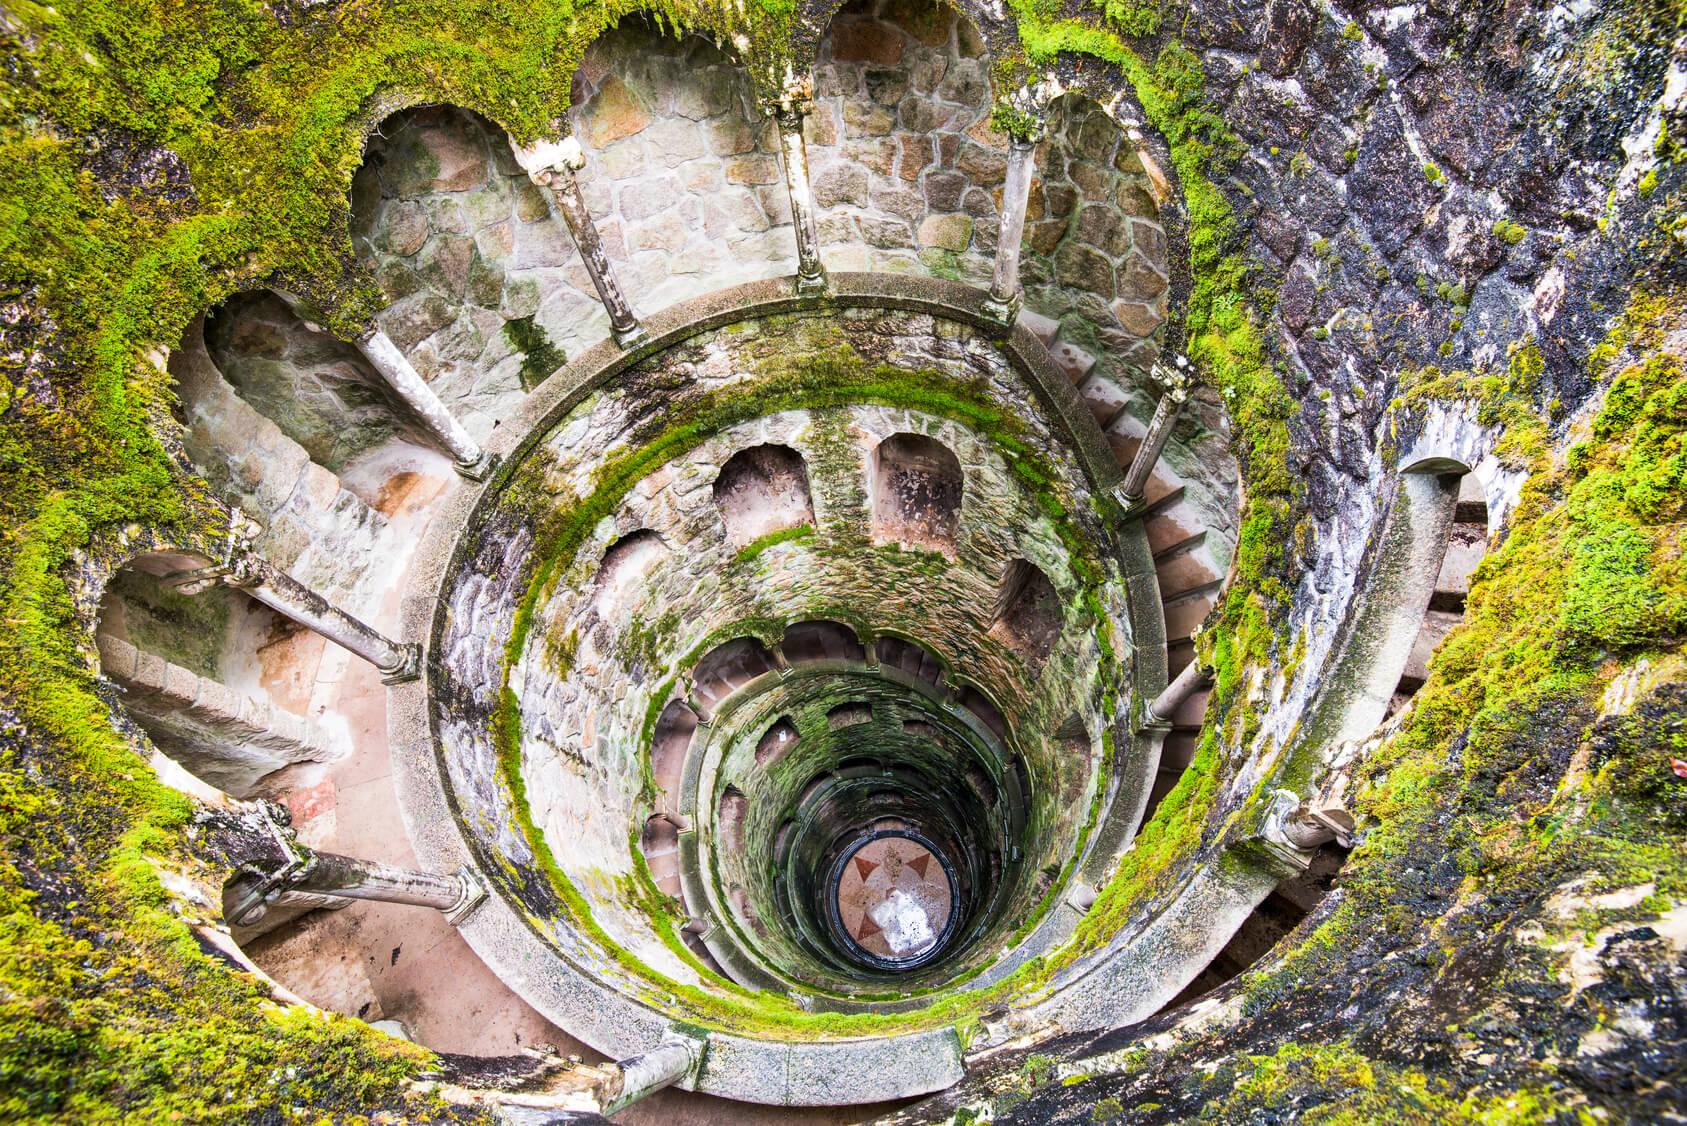 Image of Quinta da Regaleira, Sintra